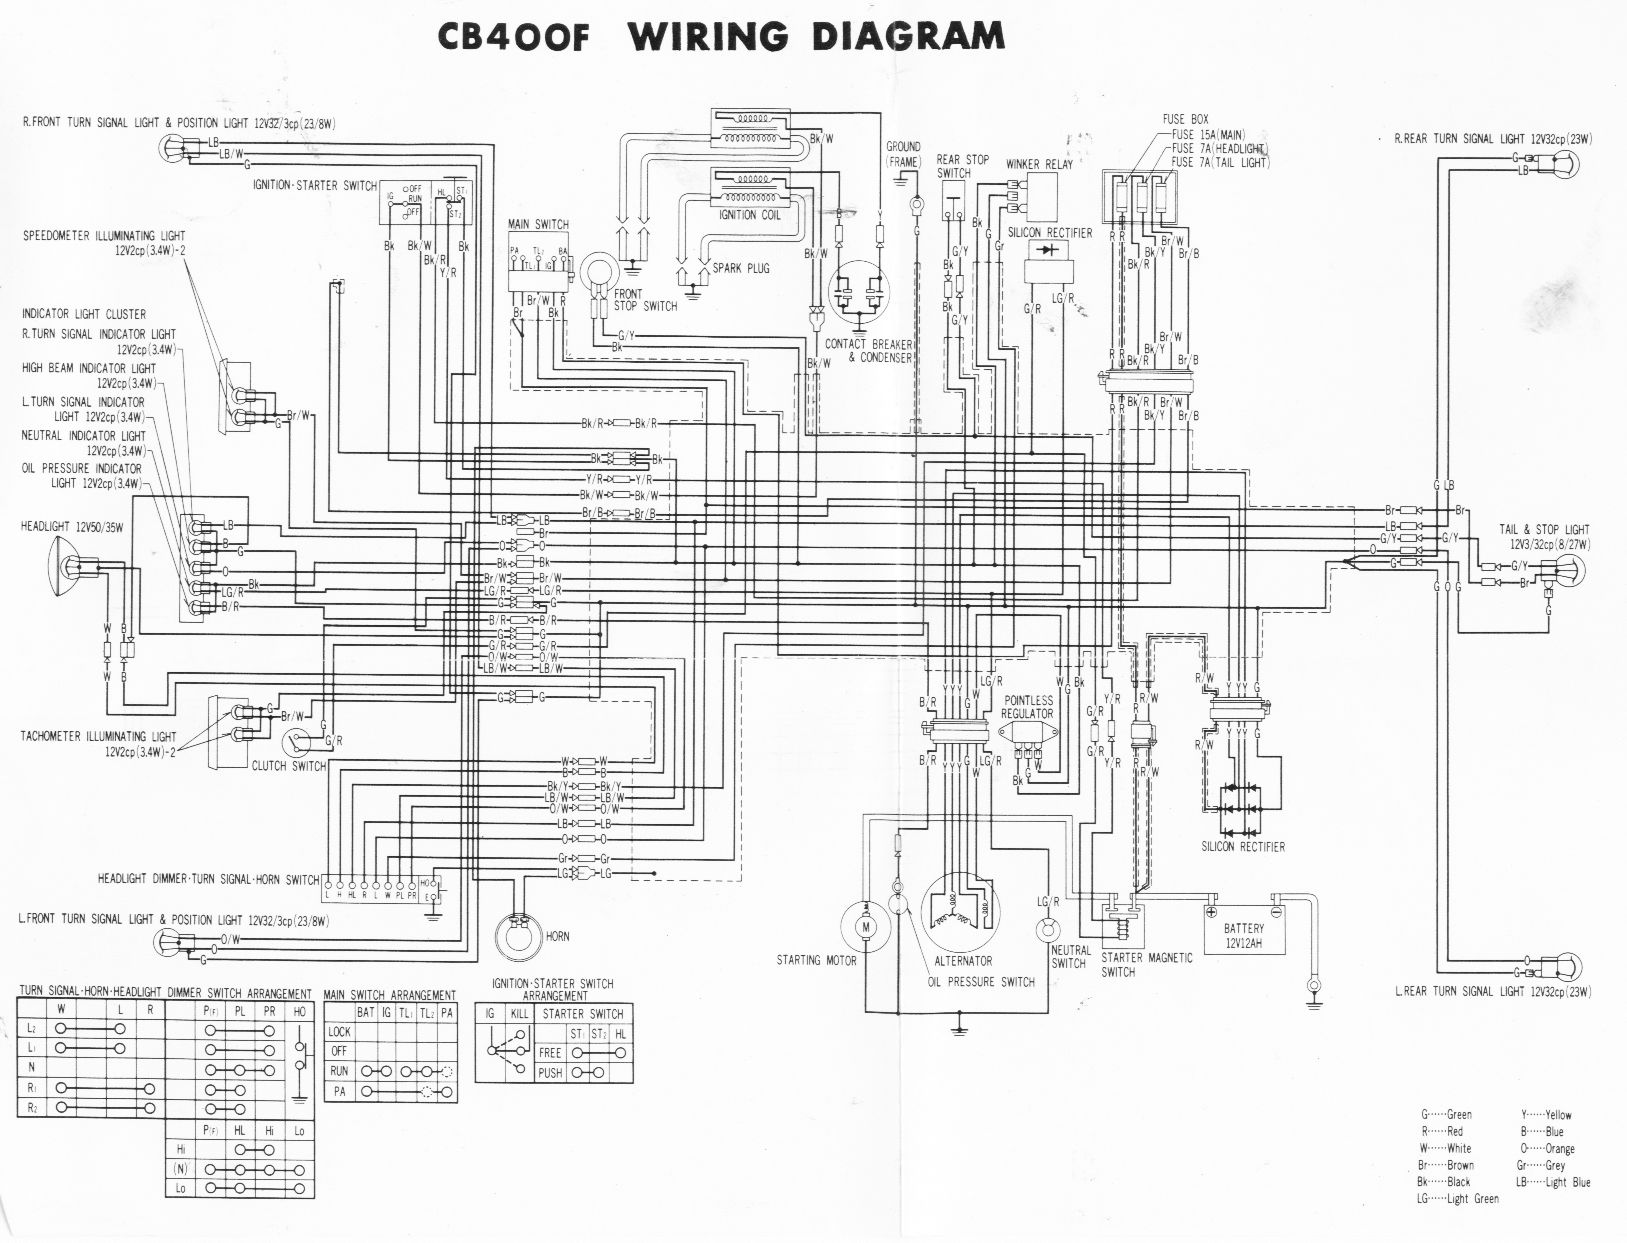 1977 honda cb550 wiring diagram